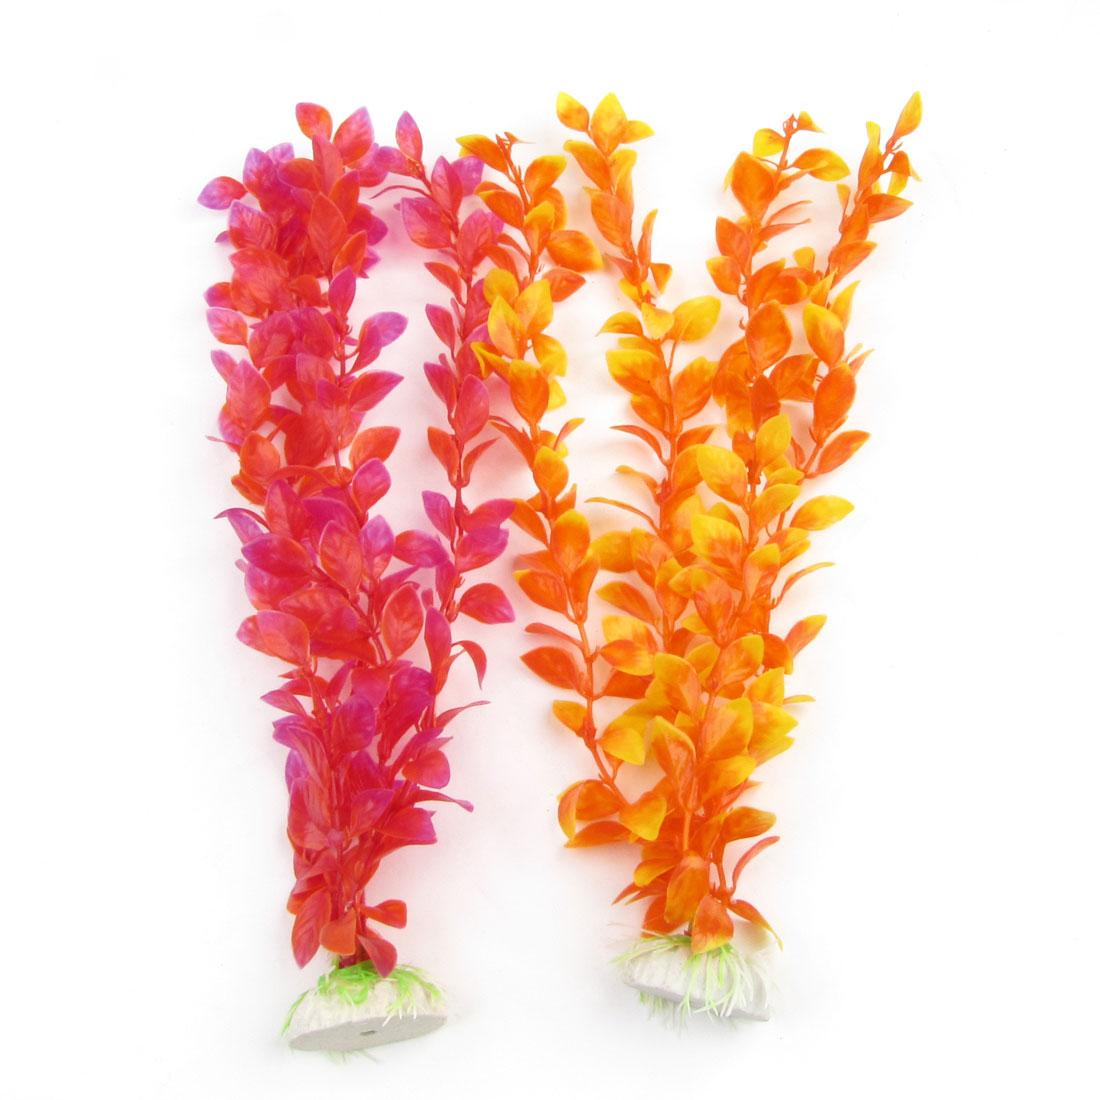 2 Pcs Fish Tank Aquariums Emulation Orange Red Plastic Water Plant Ornament